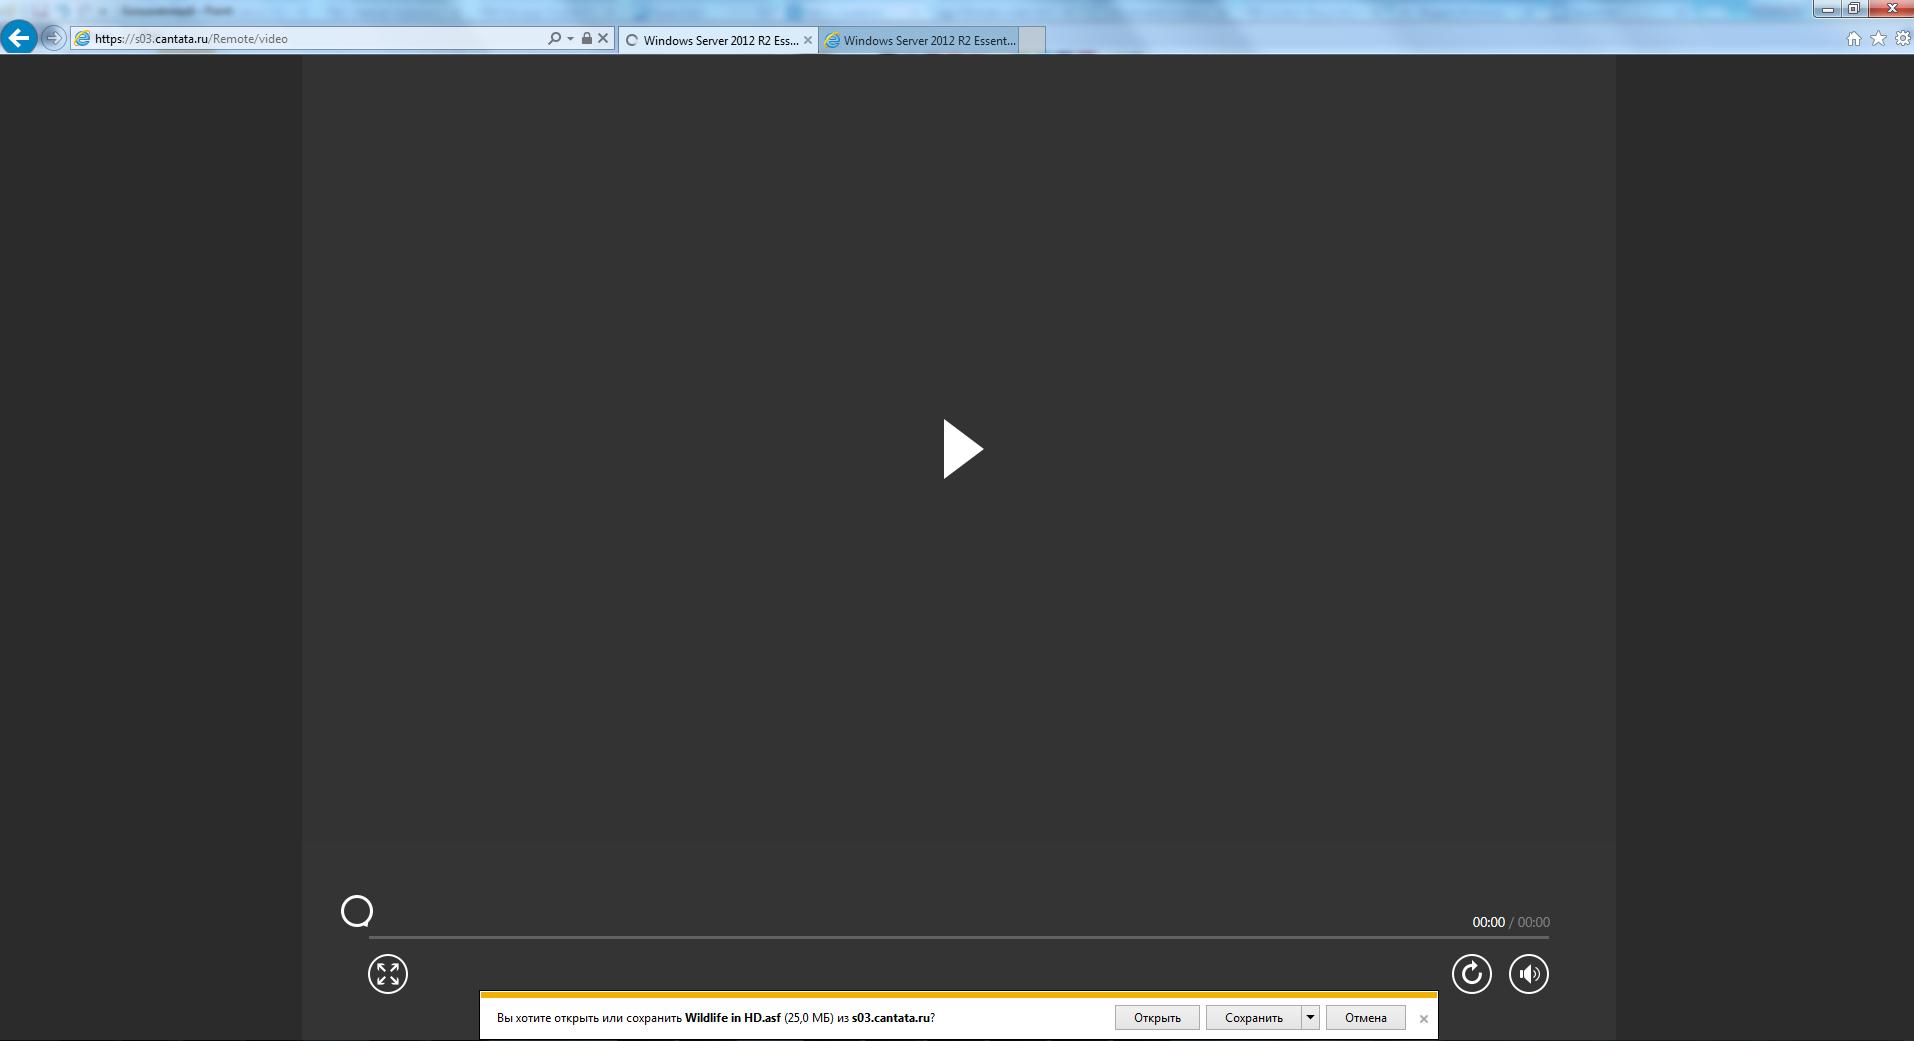 Windows Server Essentials Media Pack streaming video not working